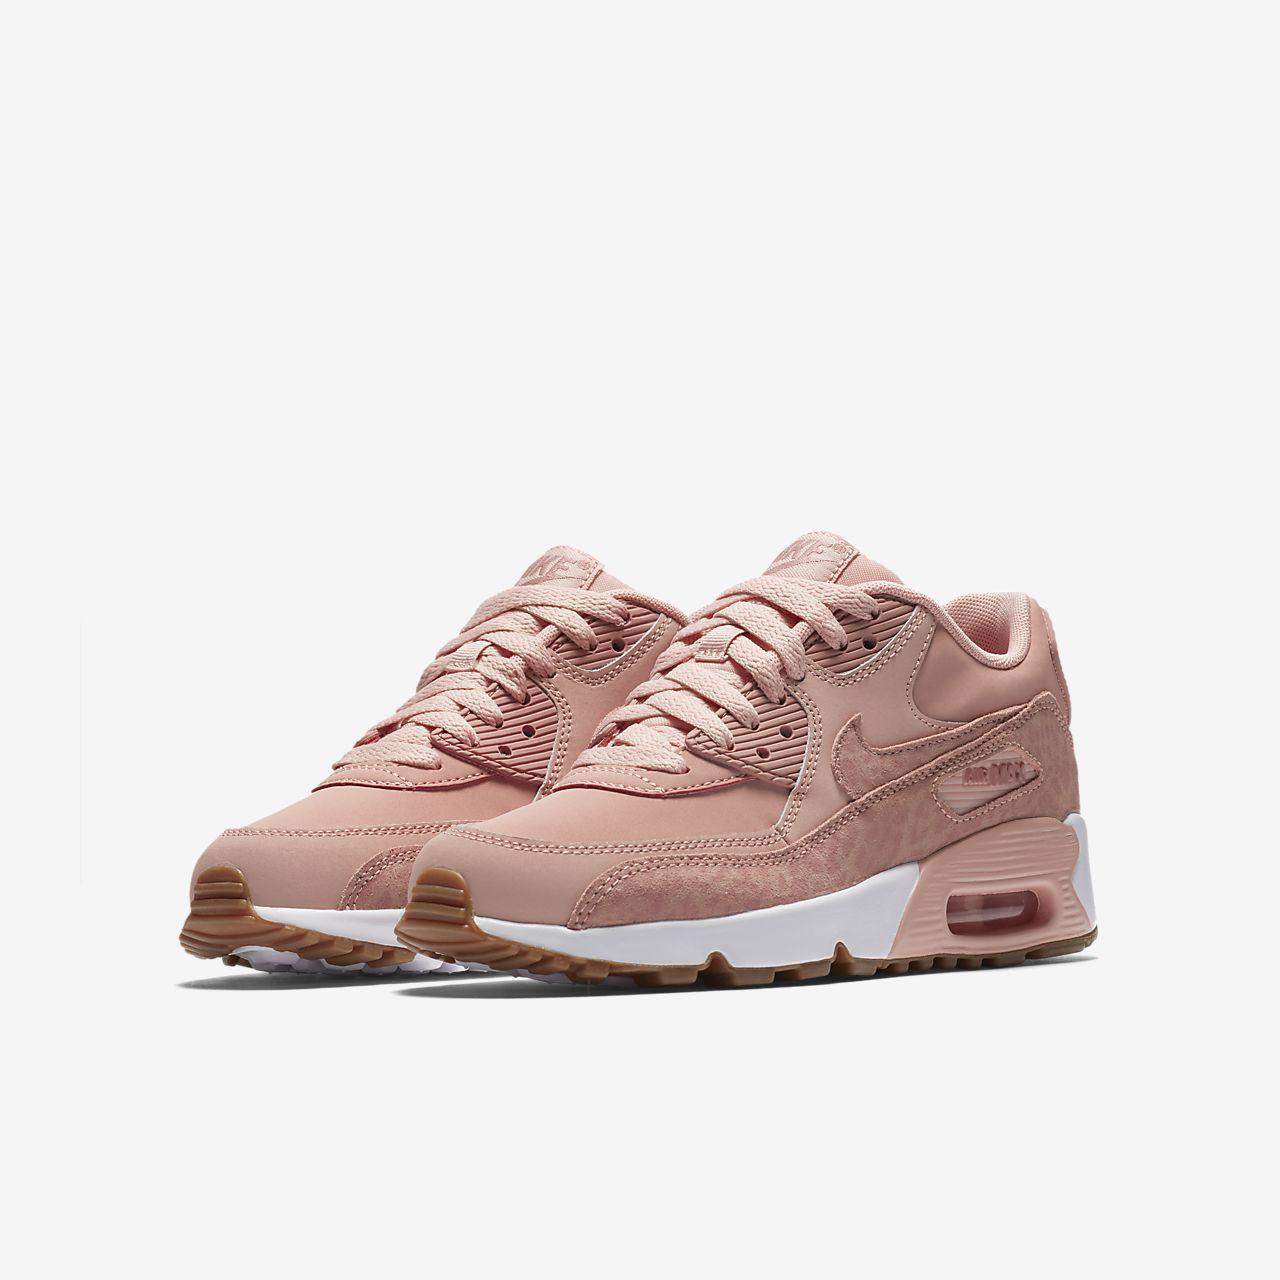 huge discount 1a915 74c22 Nike Air Max 90 SE Leather Schuh für ältere Kinder . ...